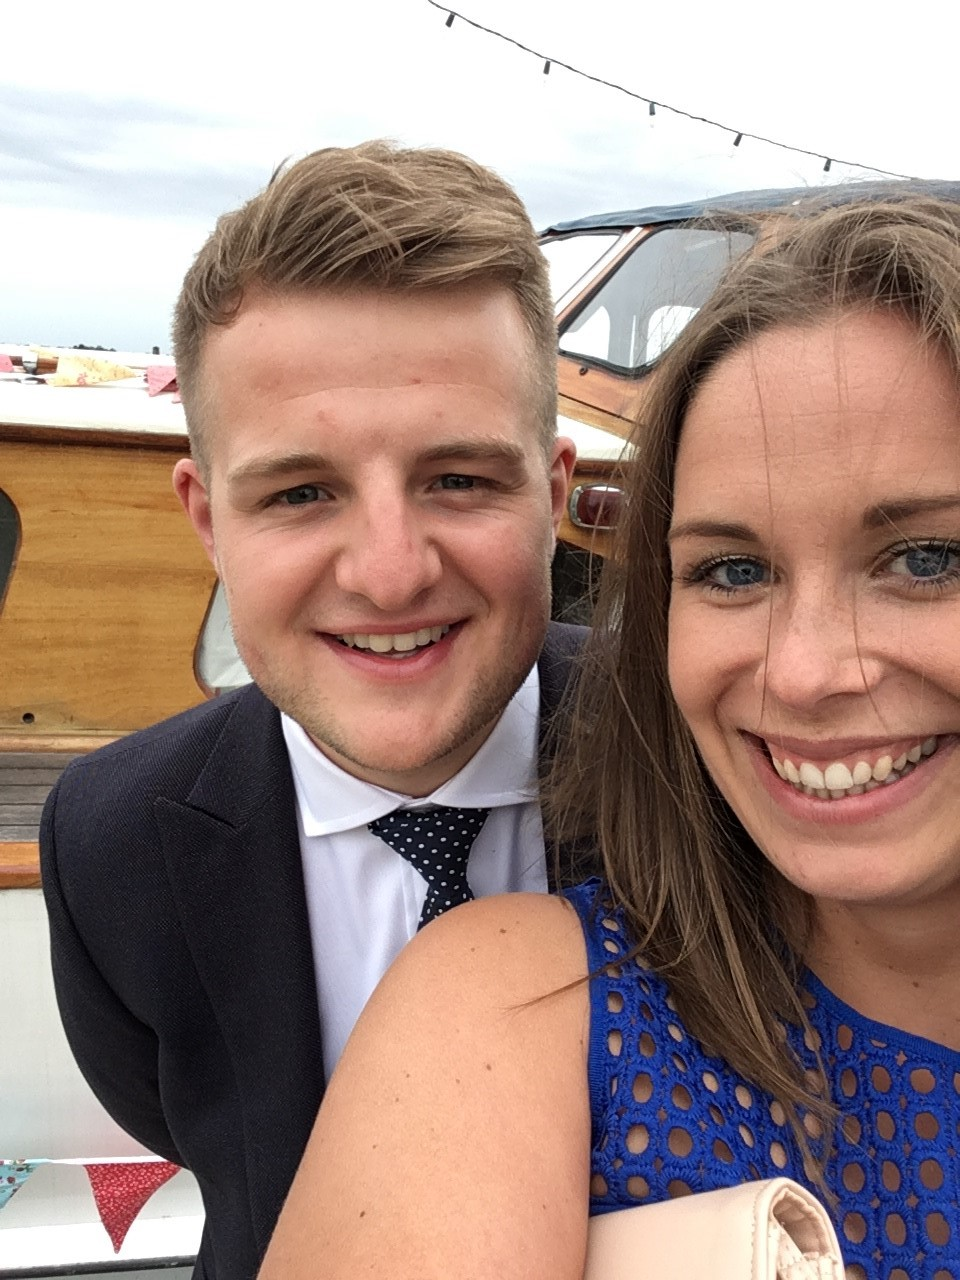 Tom and Hannah